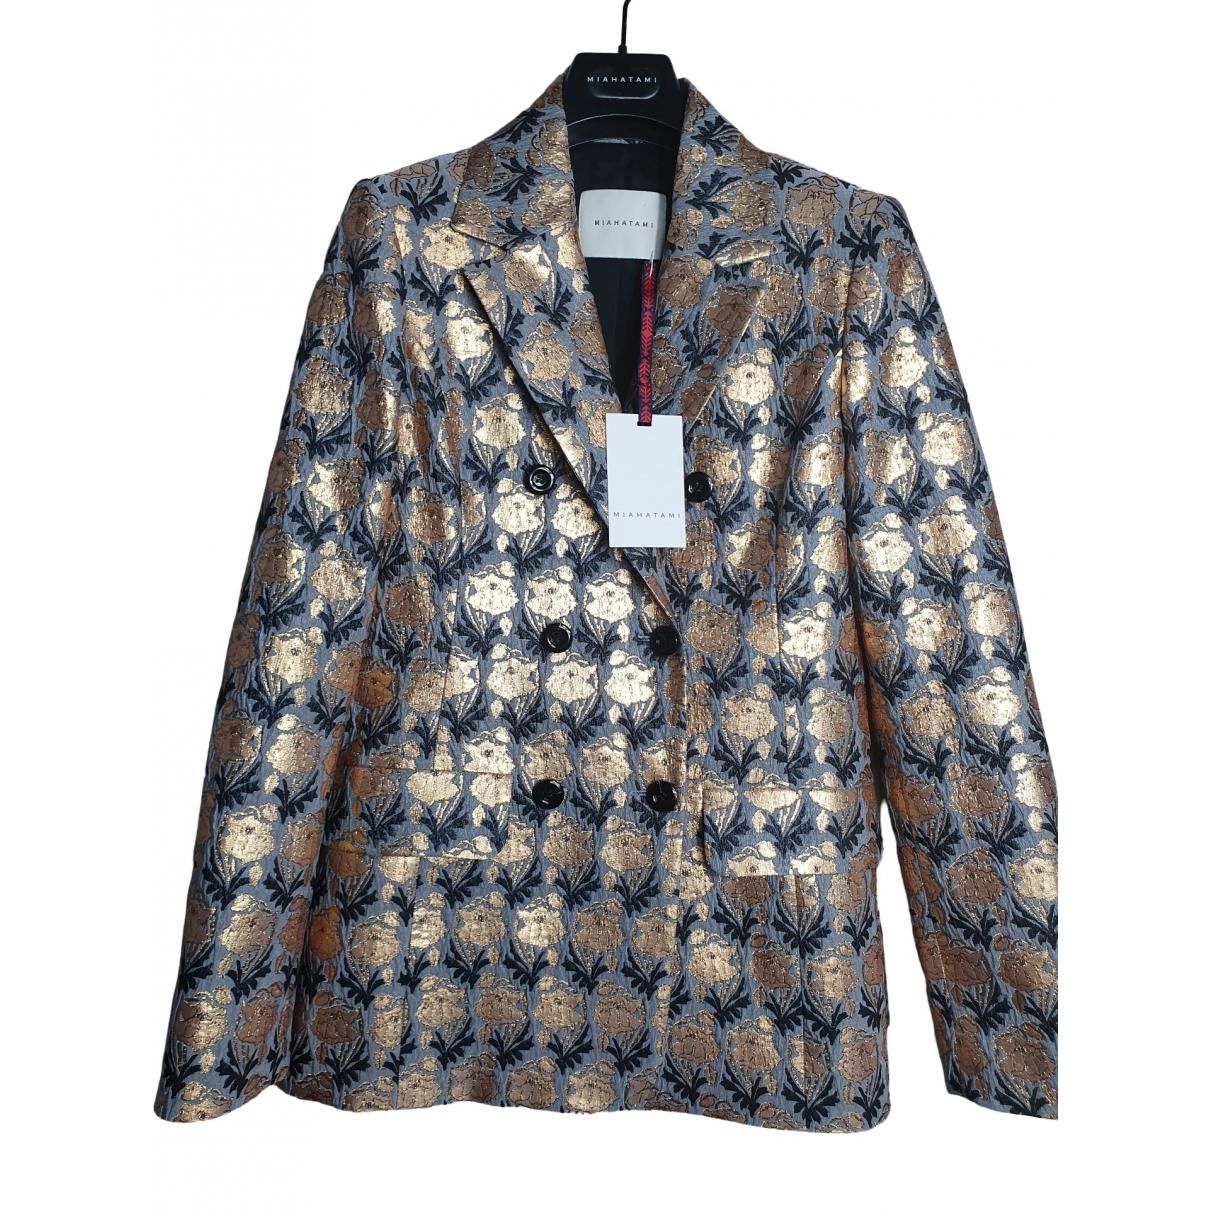 Miahatami \N Gold jacket for Women S International